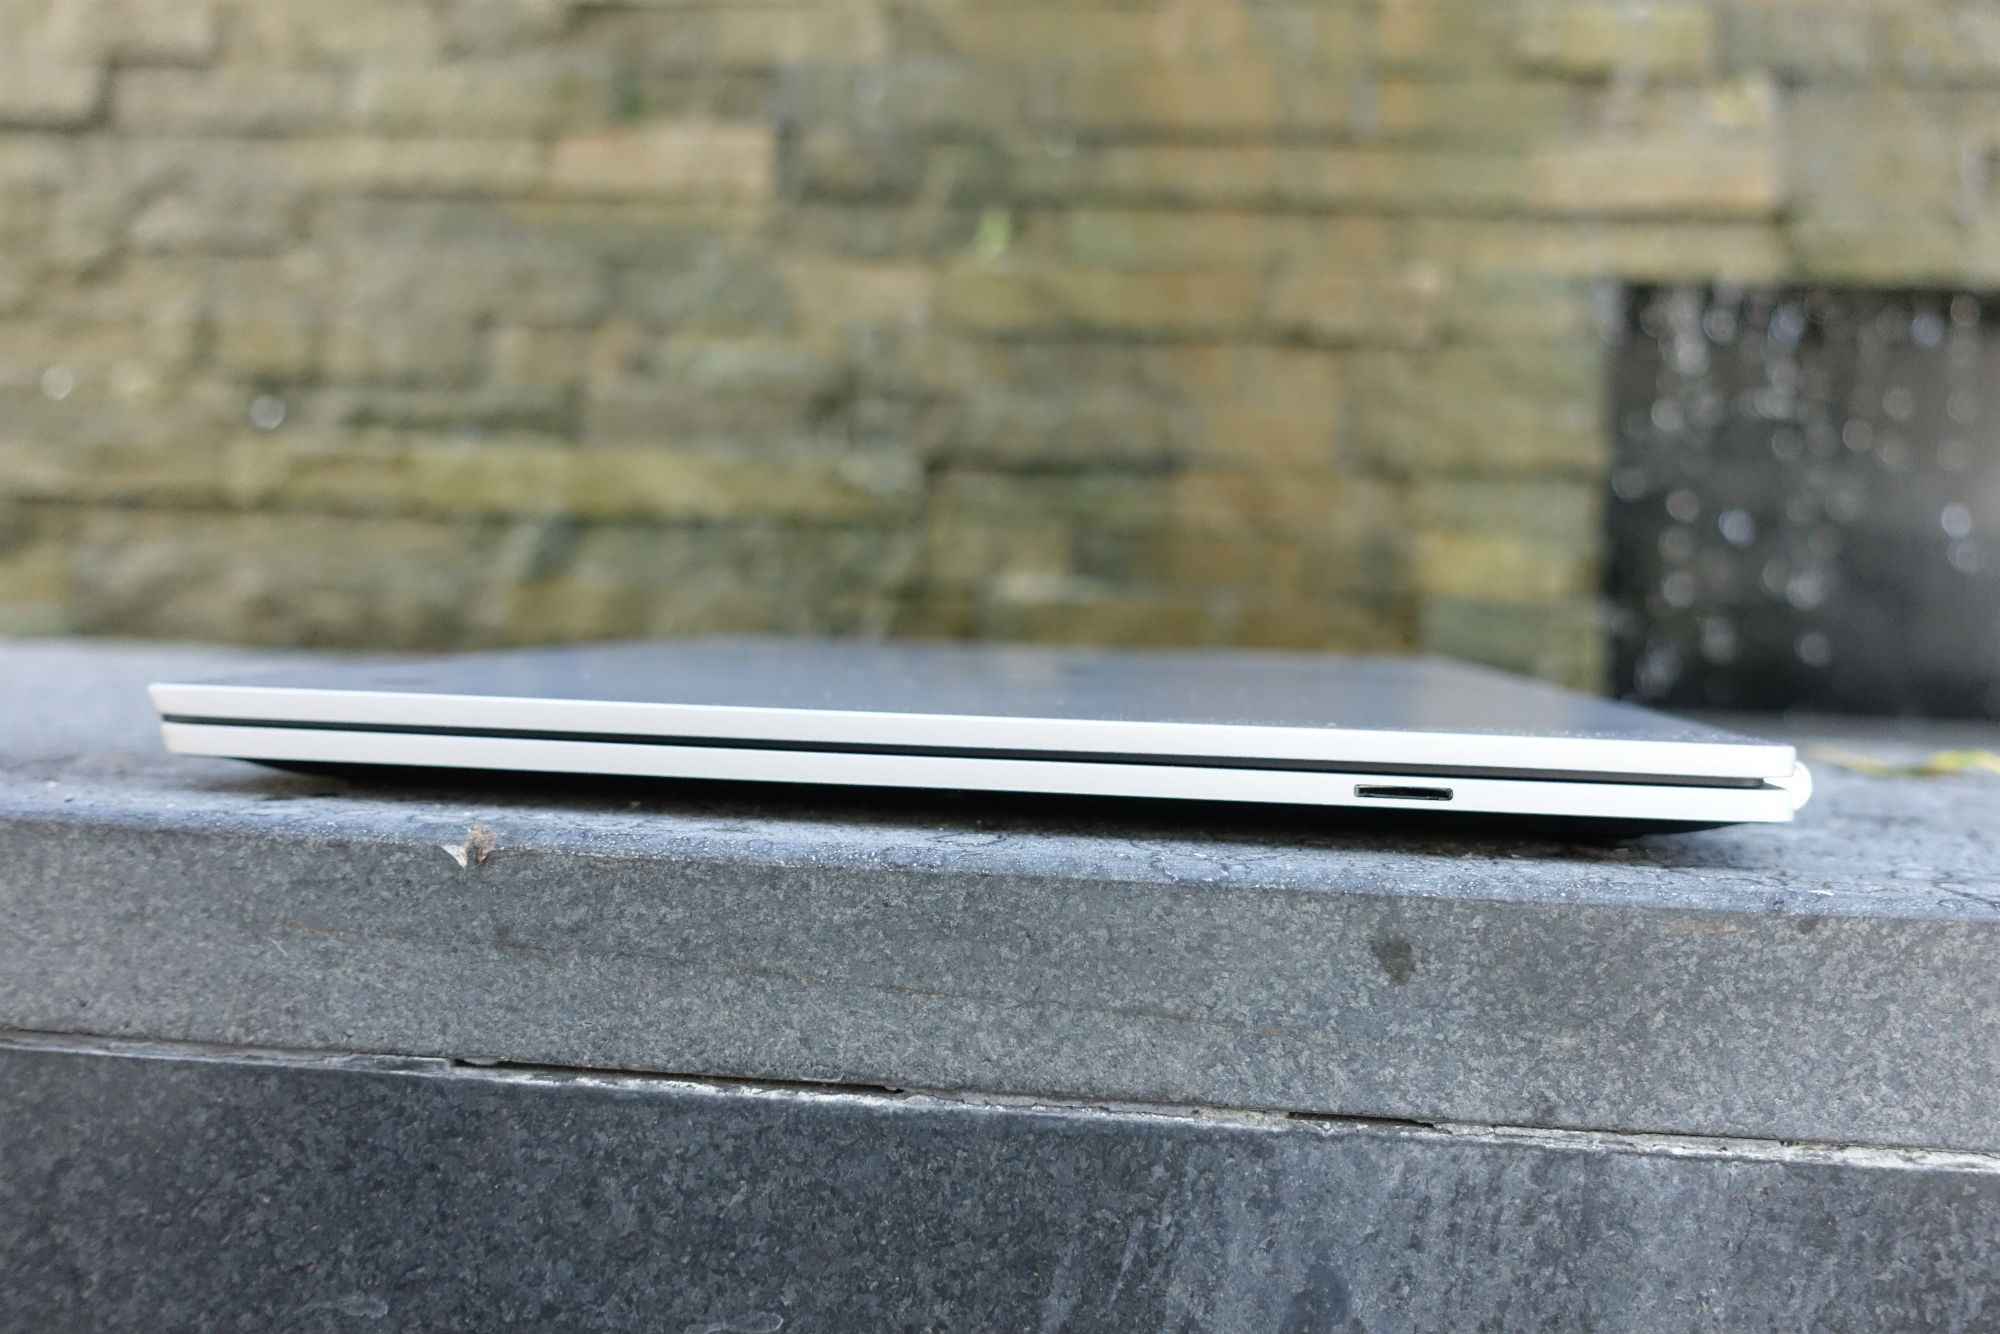 hpchromebook13 thin.jpg